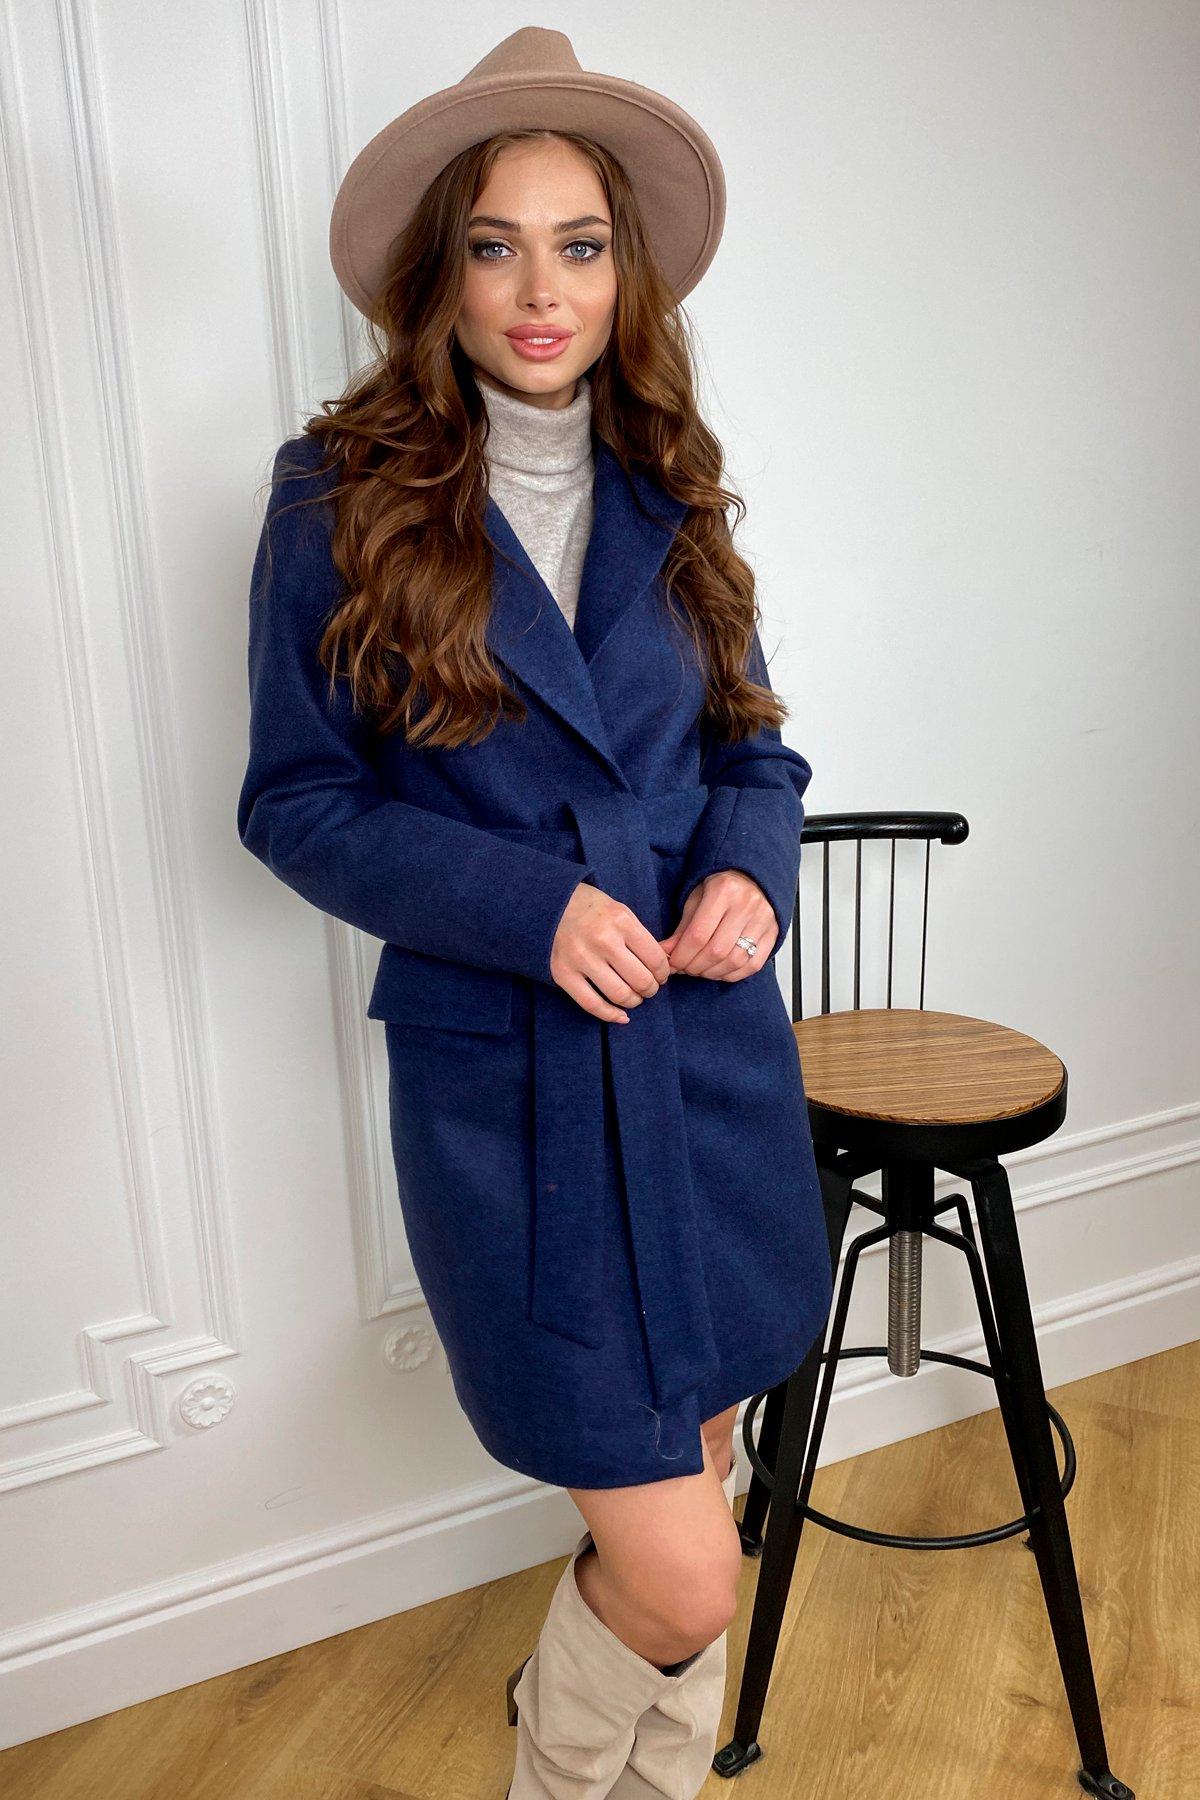 Корси кашемир меланж на трикотаже пальто 9827 АРТ. 46114 Цвет: Т.синий - фото 3, интернет магазин tm-modus.ru